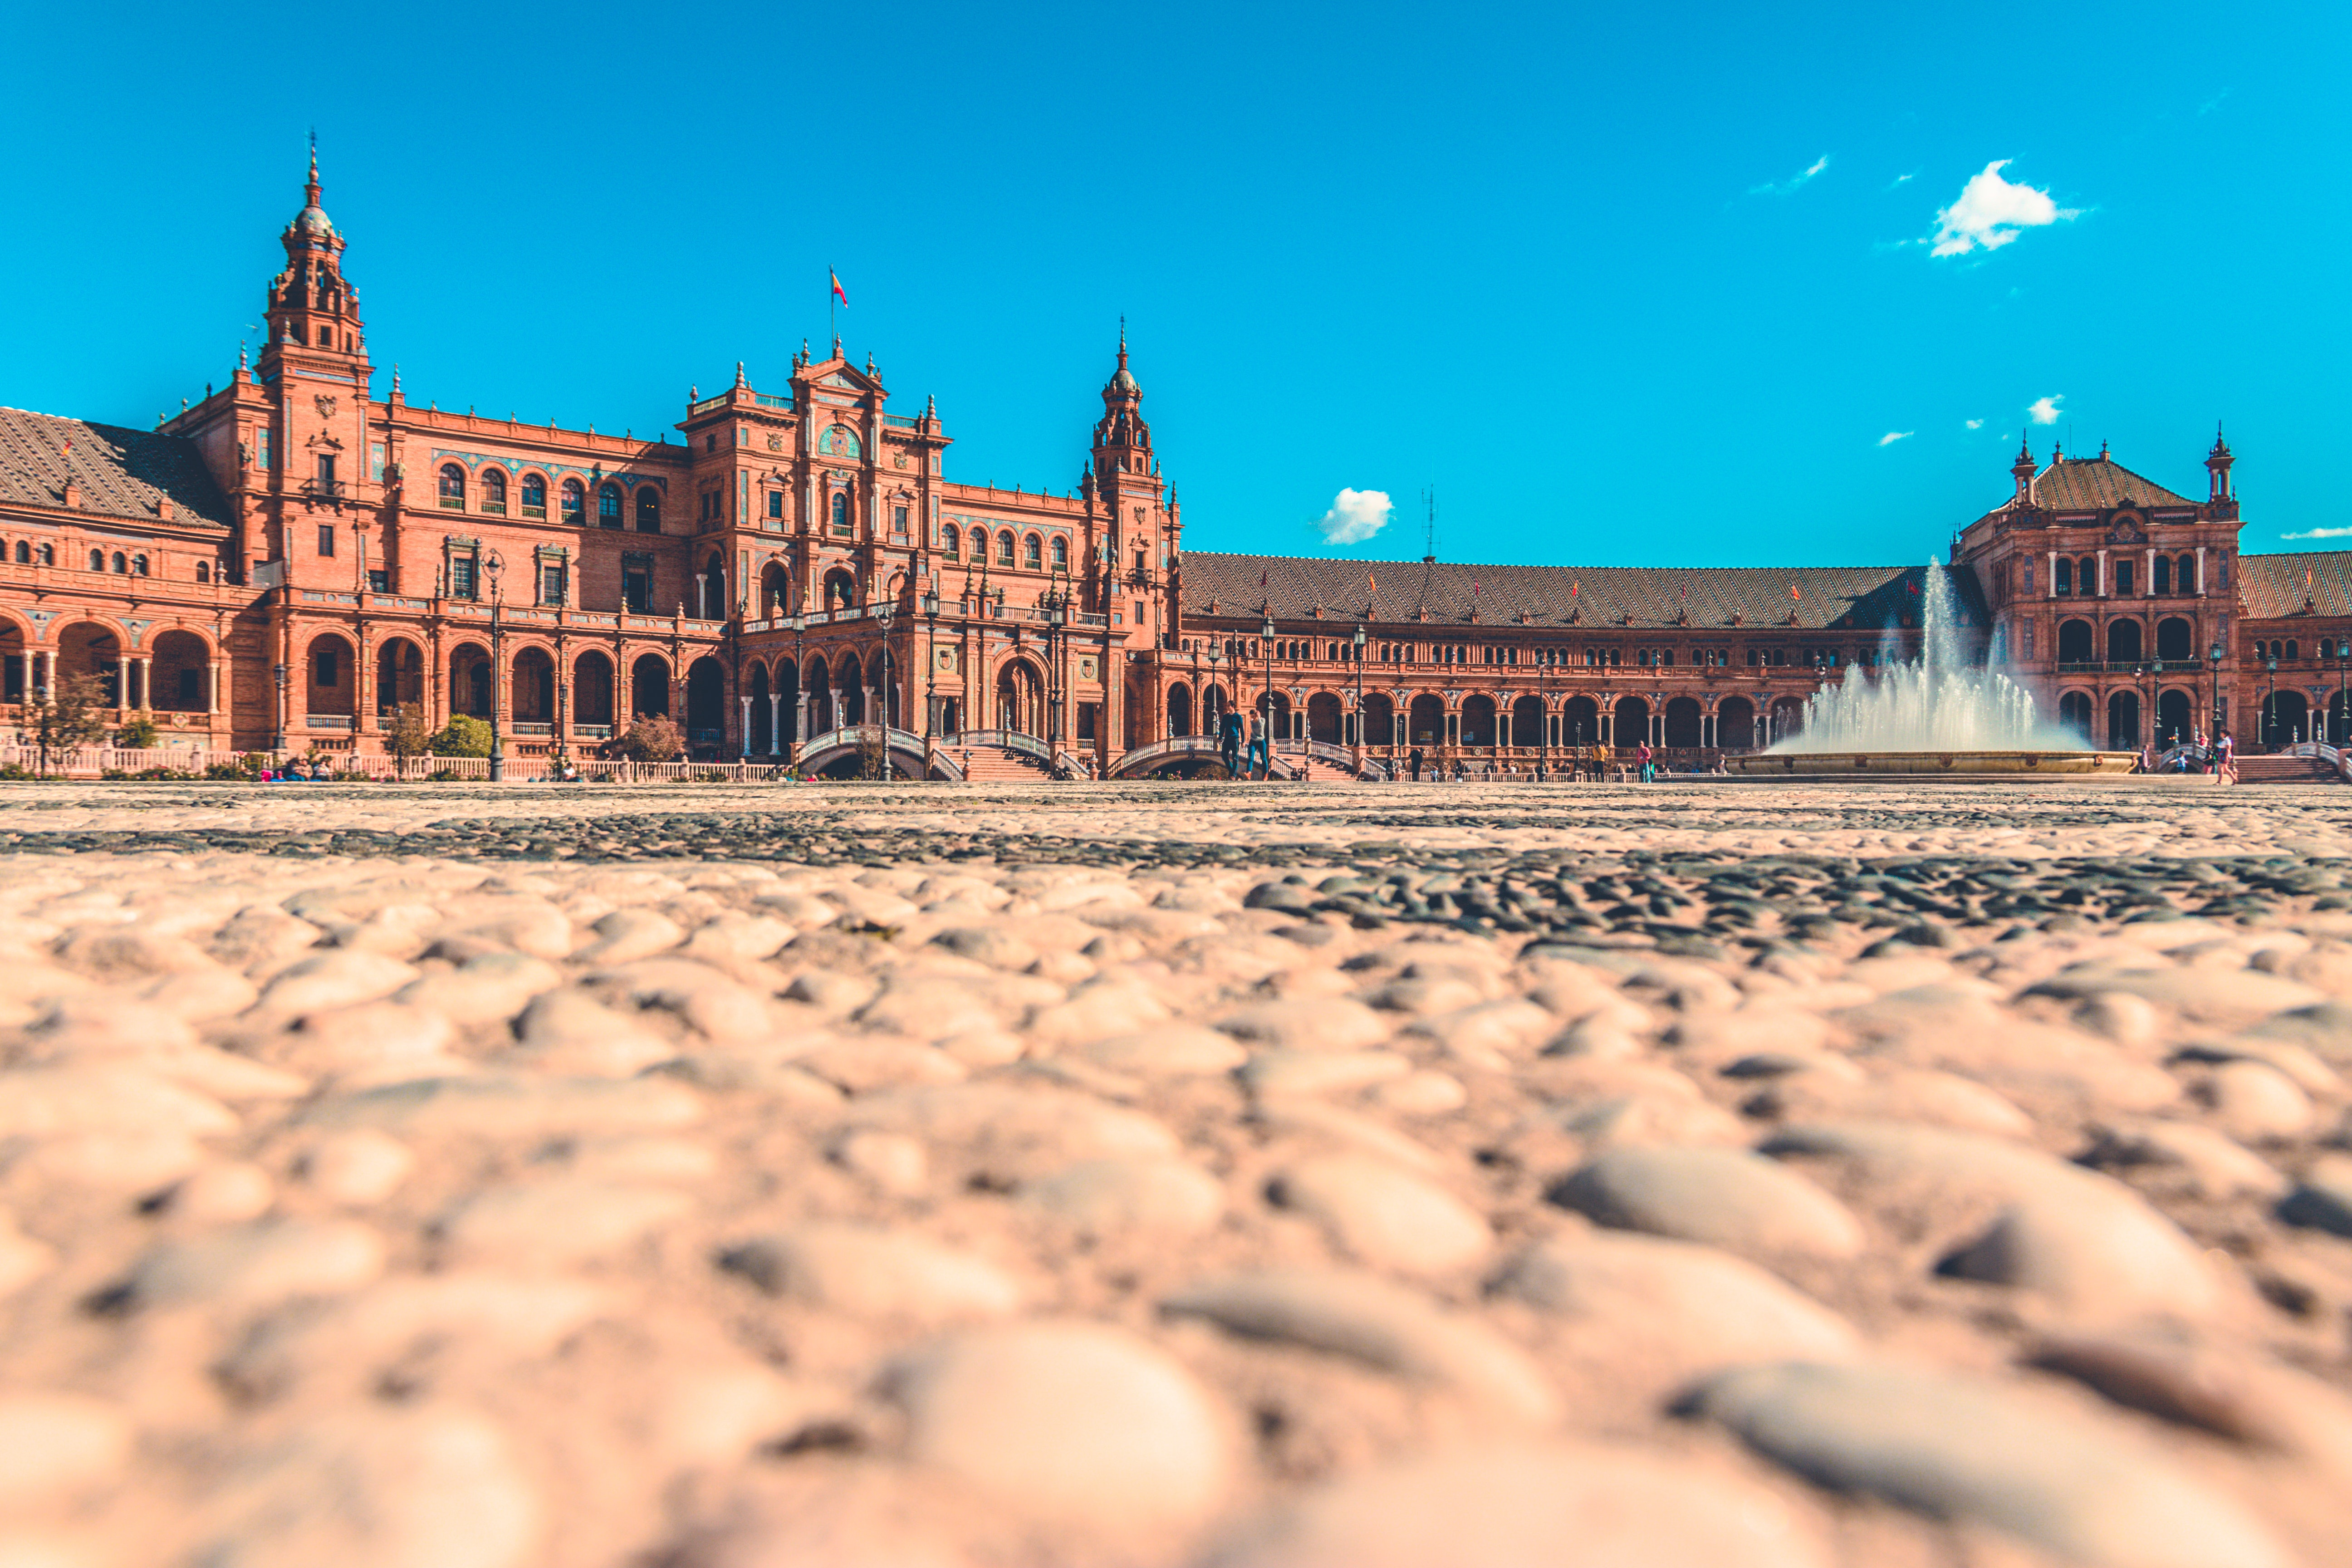 Cathedral, Alcazar, and Archivo de Indias, Seville